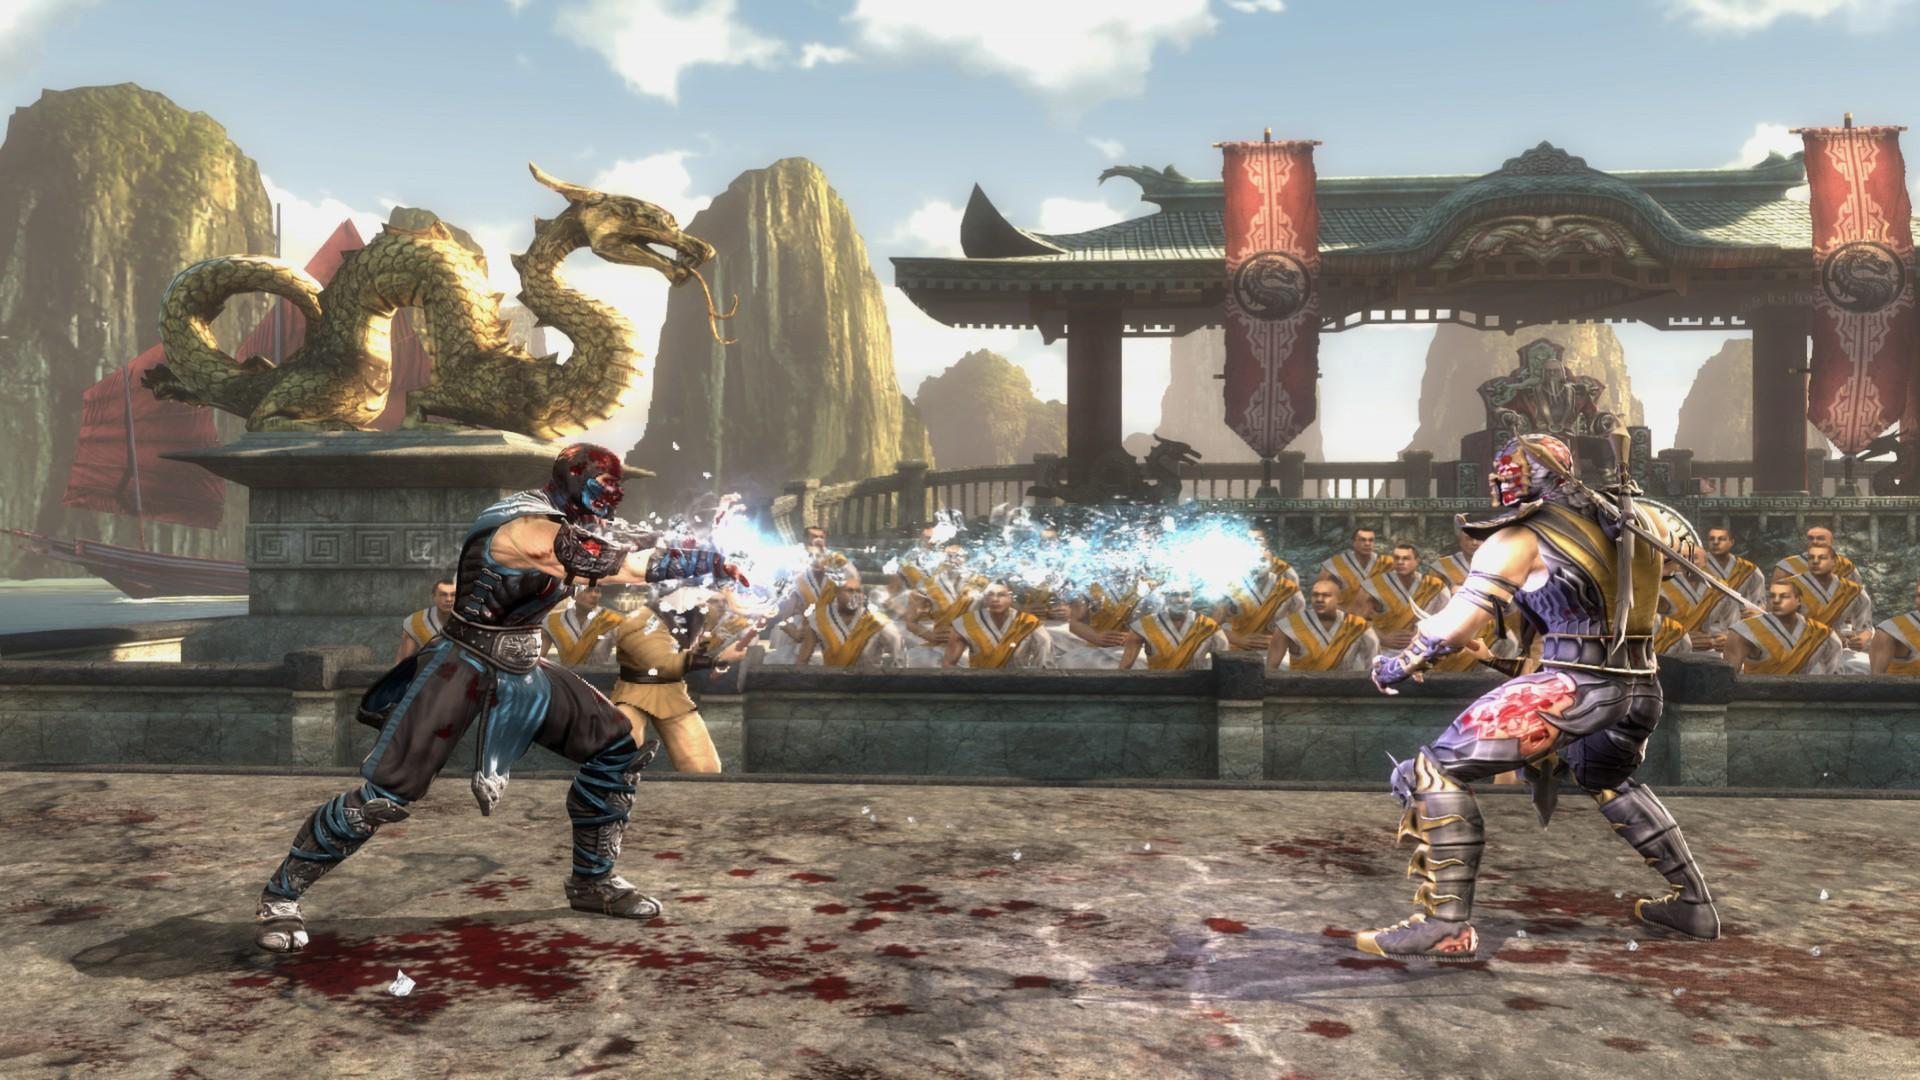 mortal kombat gambar Mortal Kombat Komplete Edition Screenshot HD 1920x1080